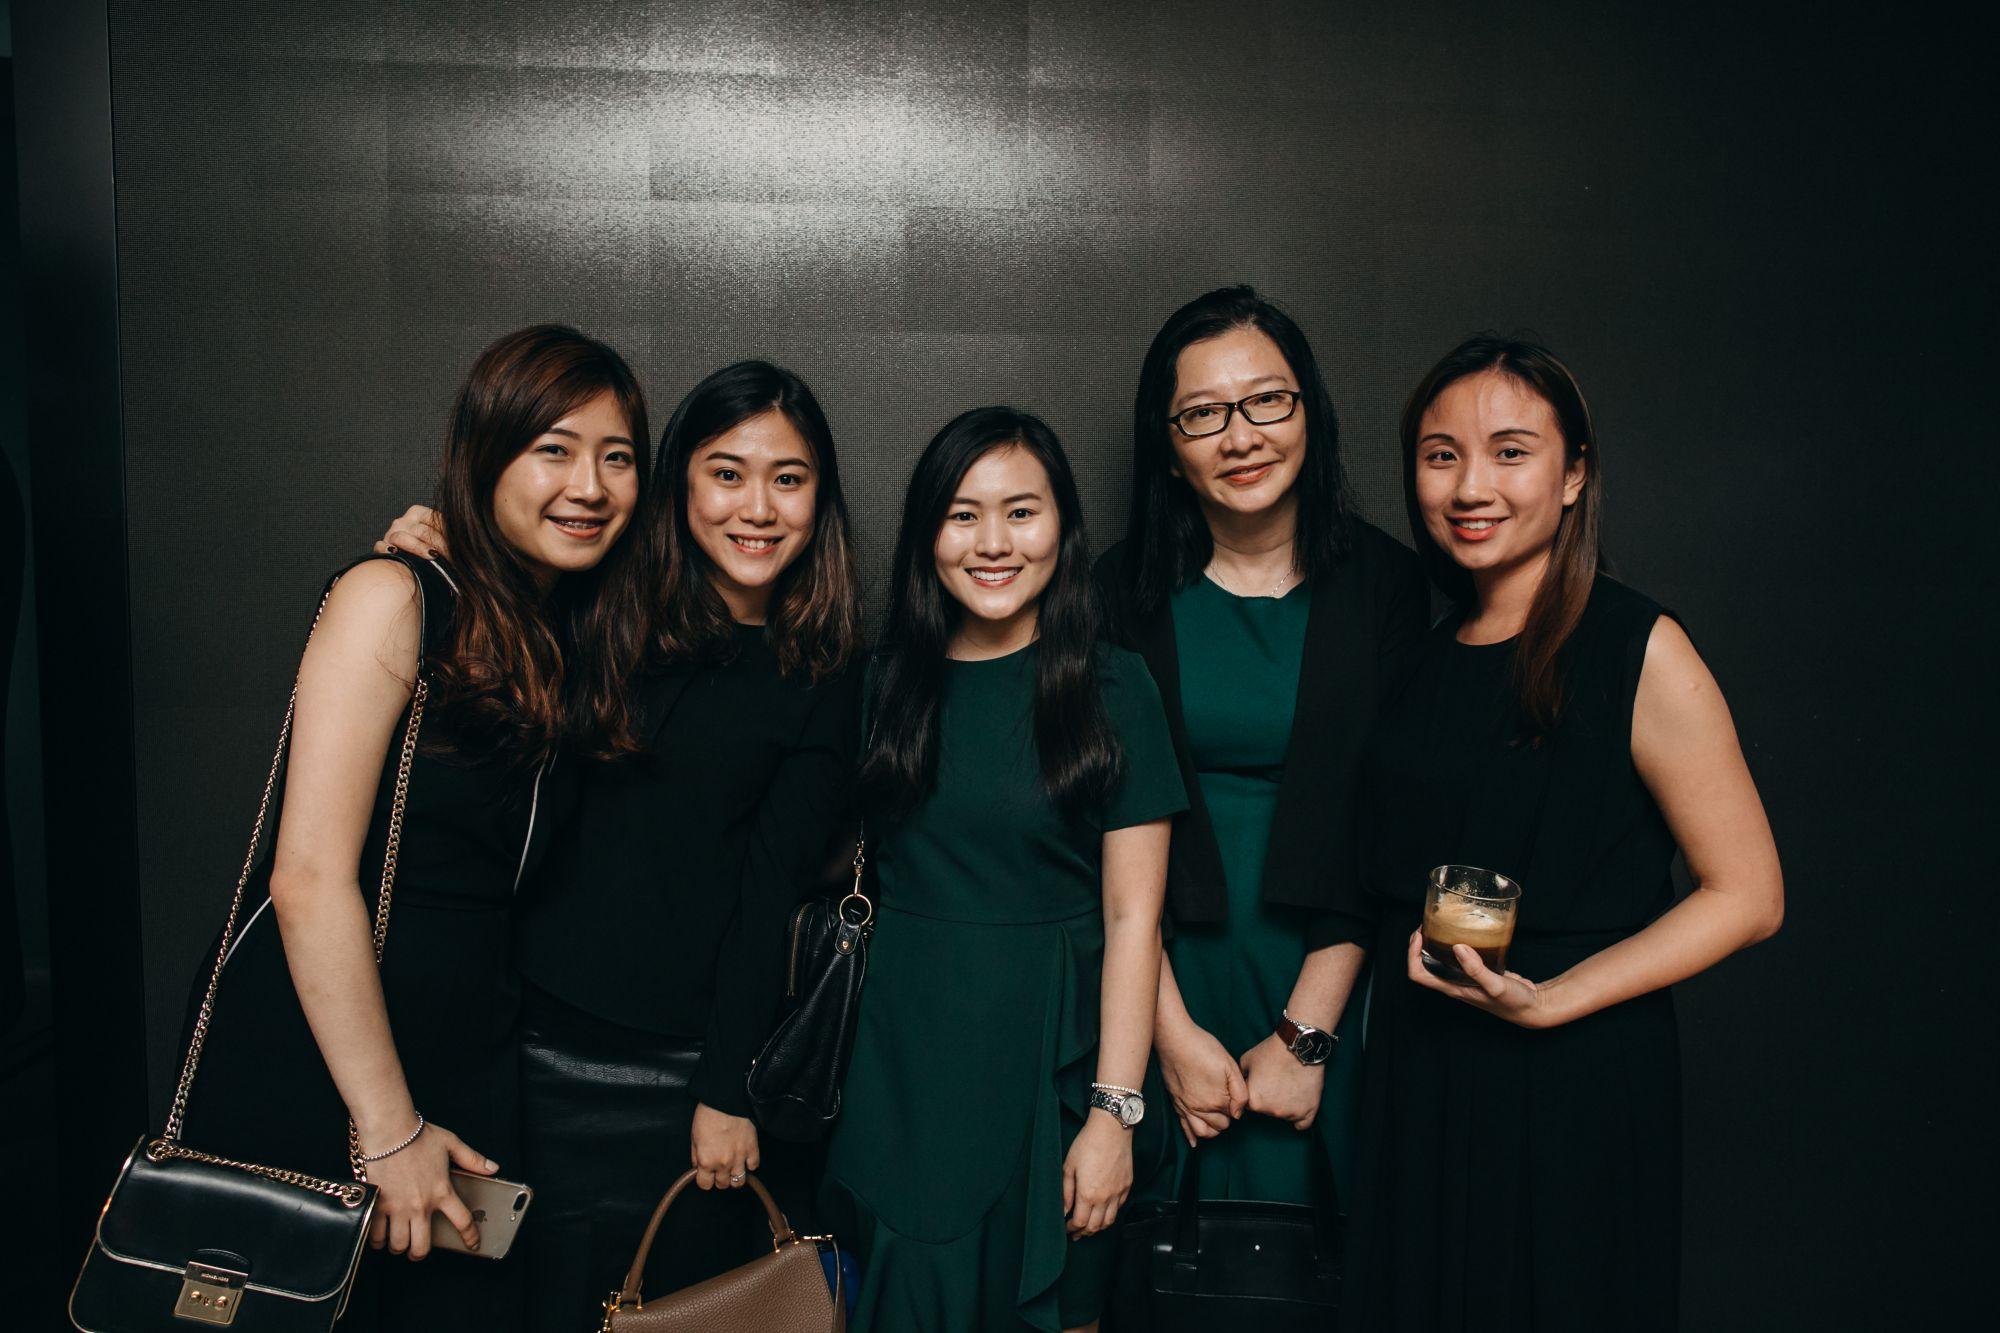 Felicia Lim, Lily Suryani, Luanne Ooi, Jerrica Goh, Jane Chen